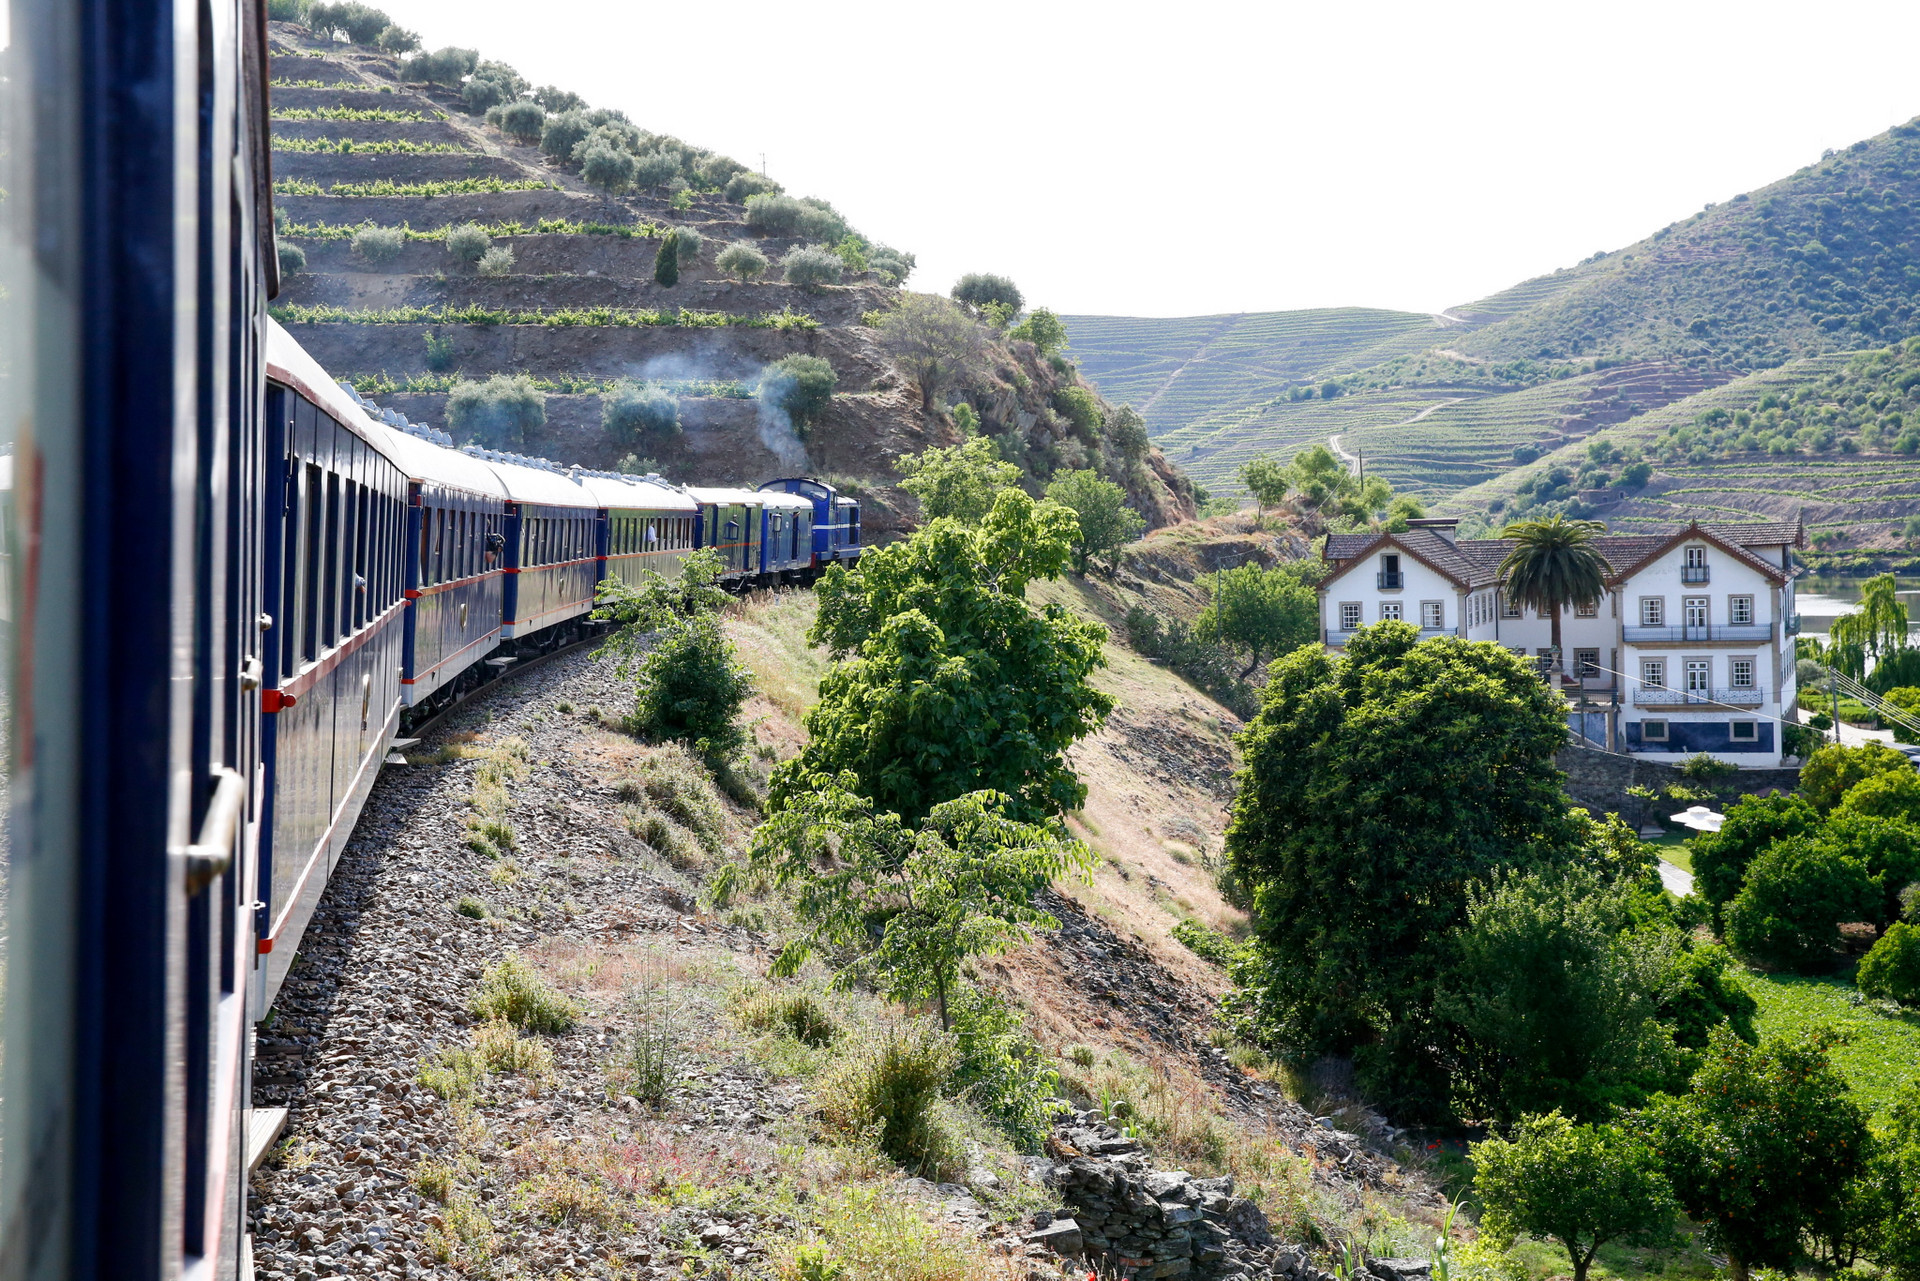 LM The Presidential Train 12.jpg